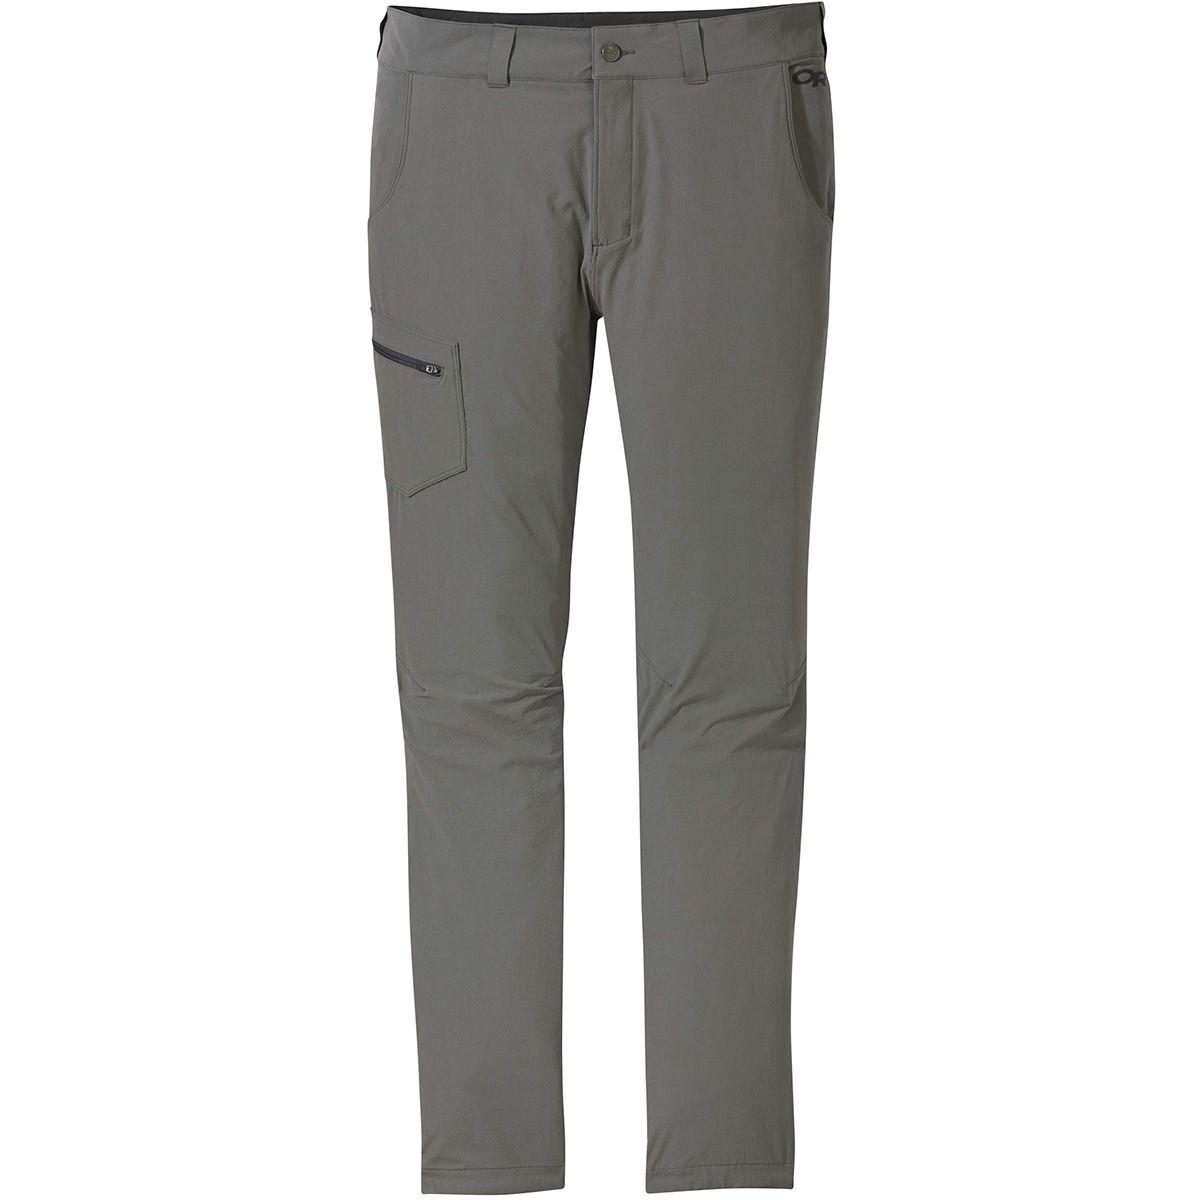 Soft Shell Pants